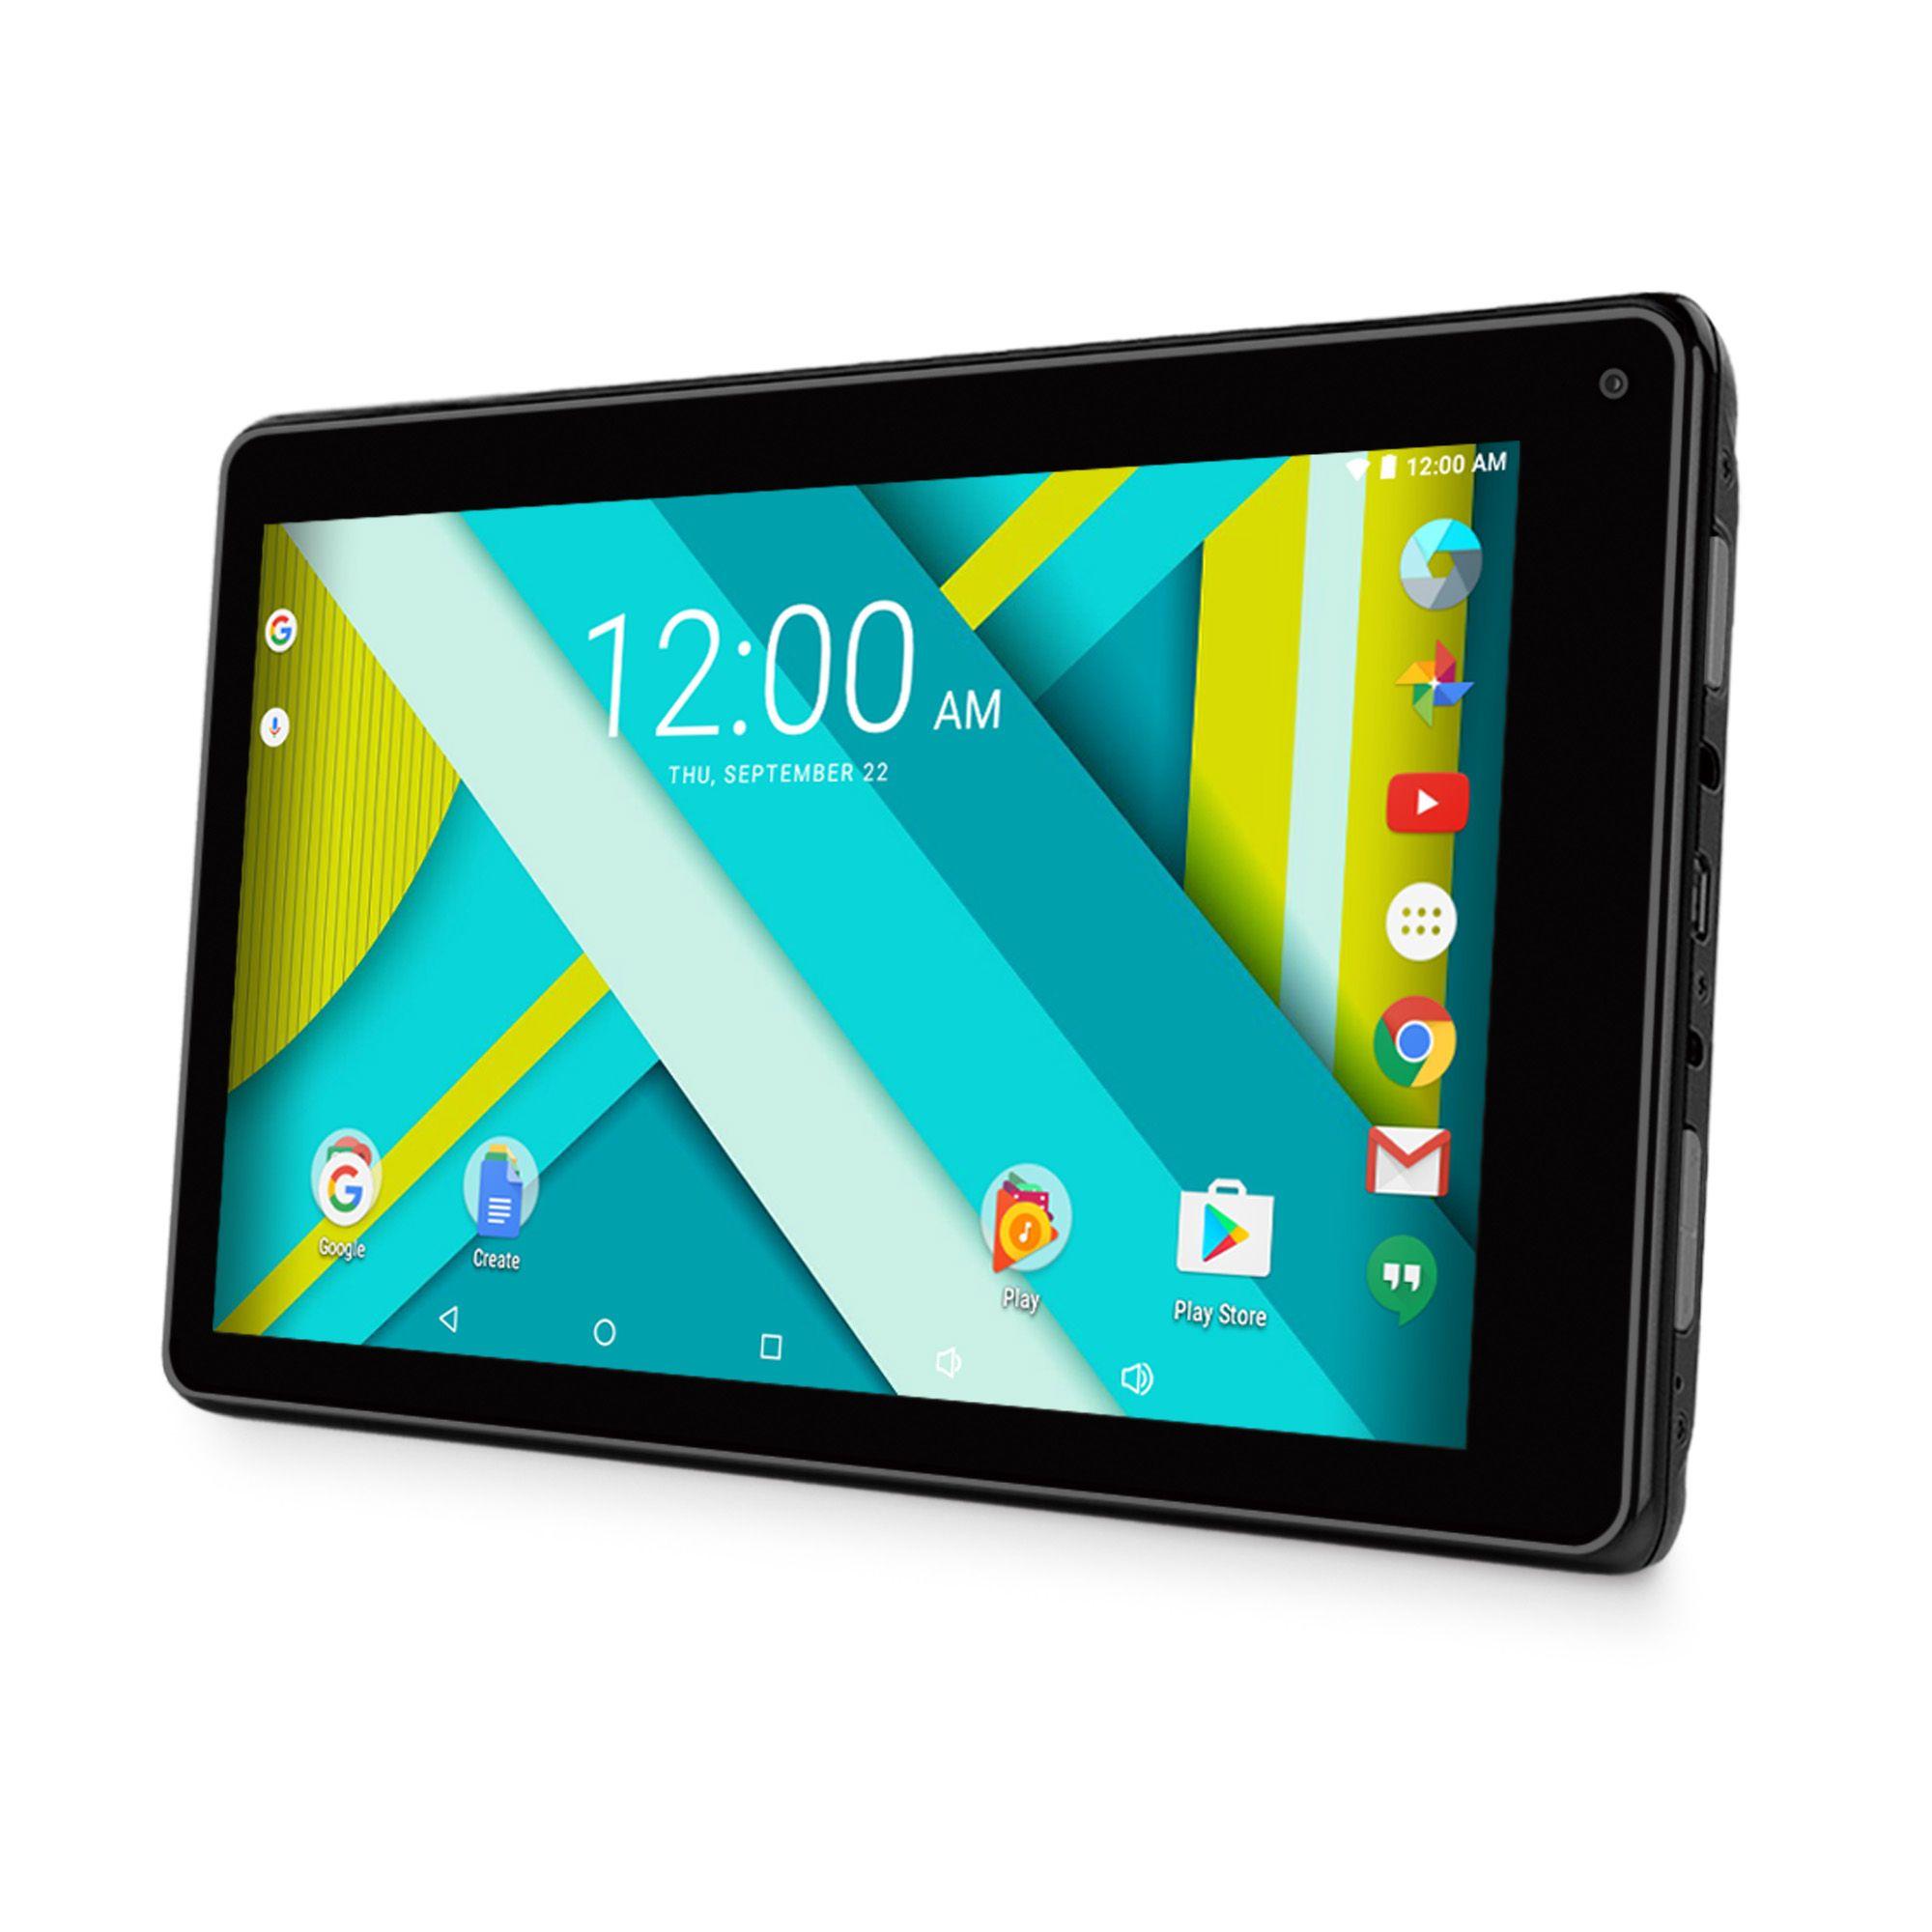 descargar netflix para tablet samsung 10.1